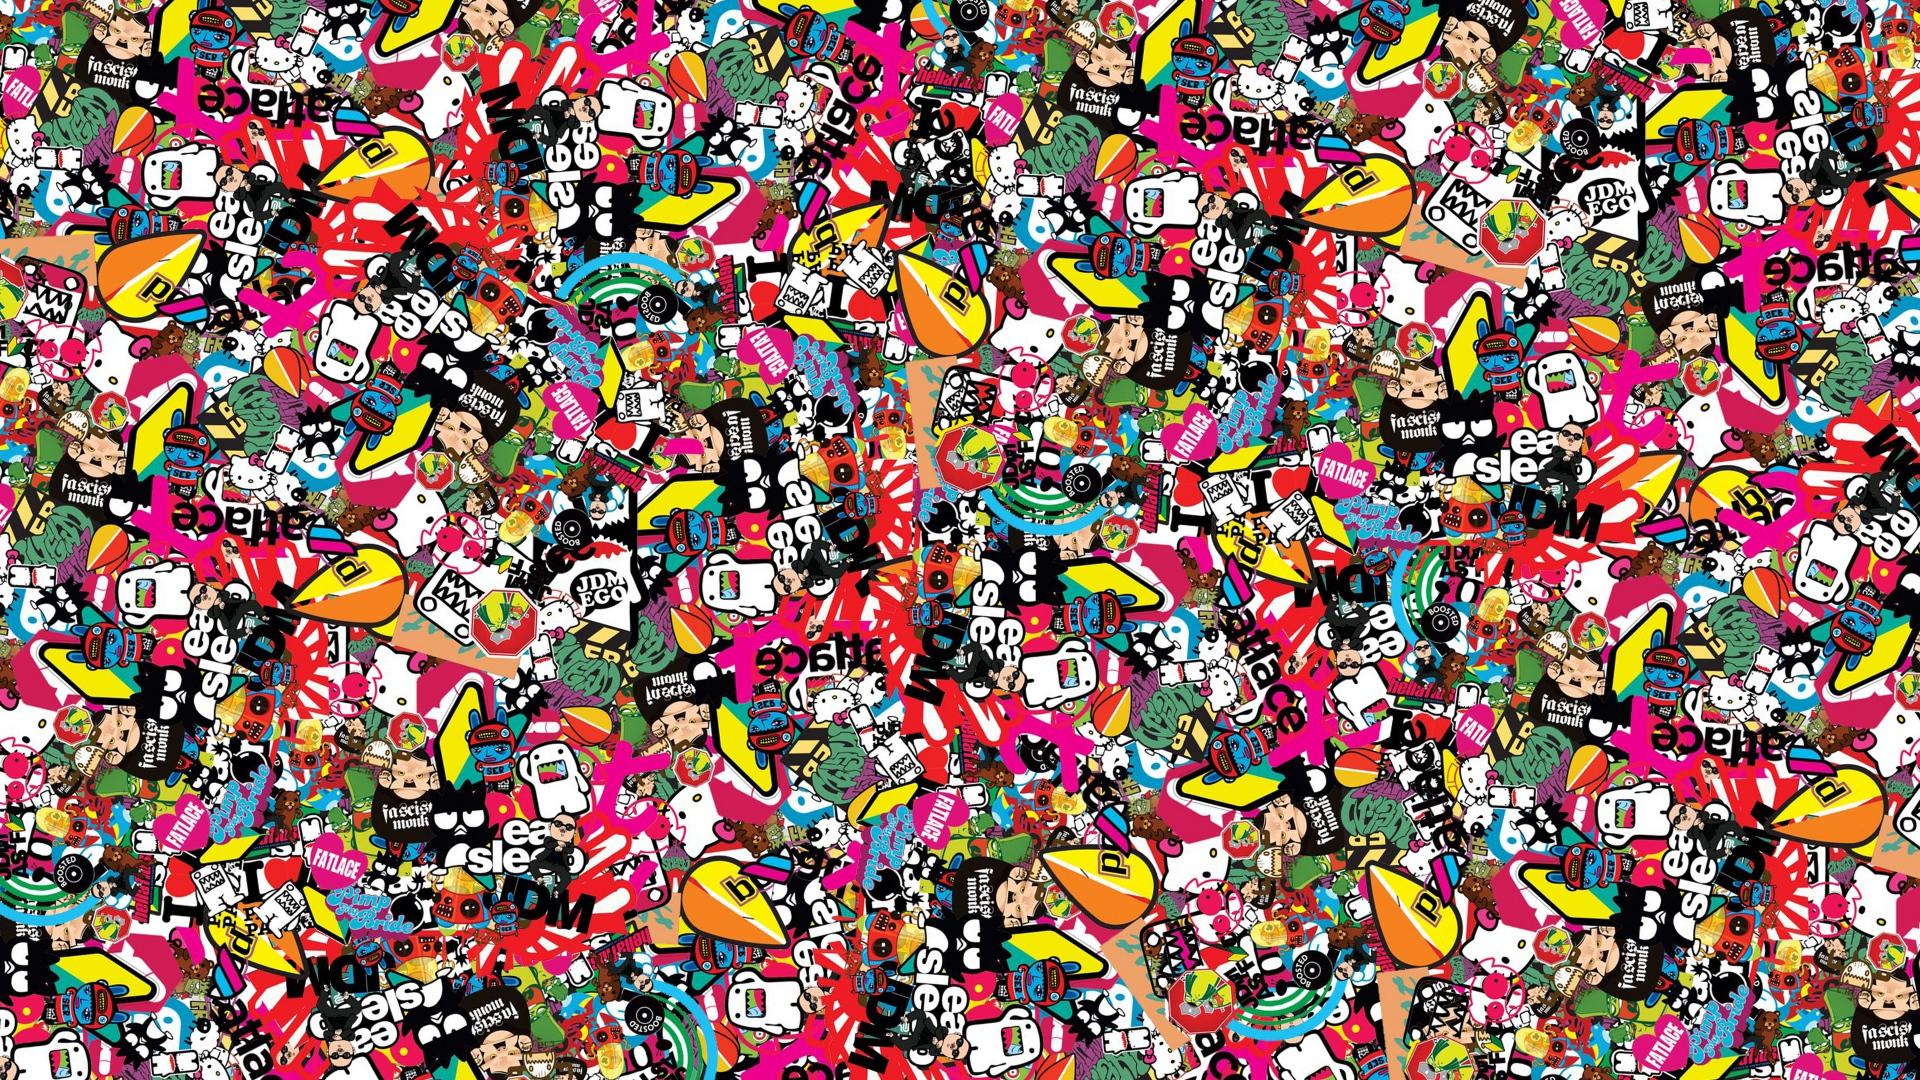 Hypebeast Anime Wallpaper Hd 1920x1080